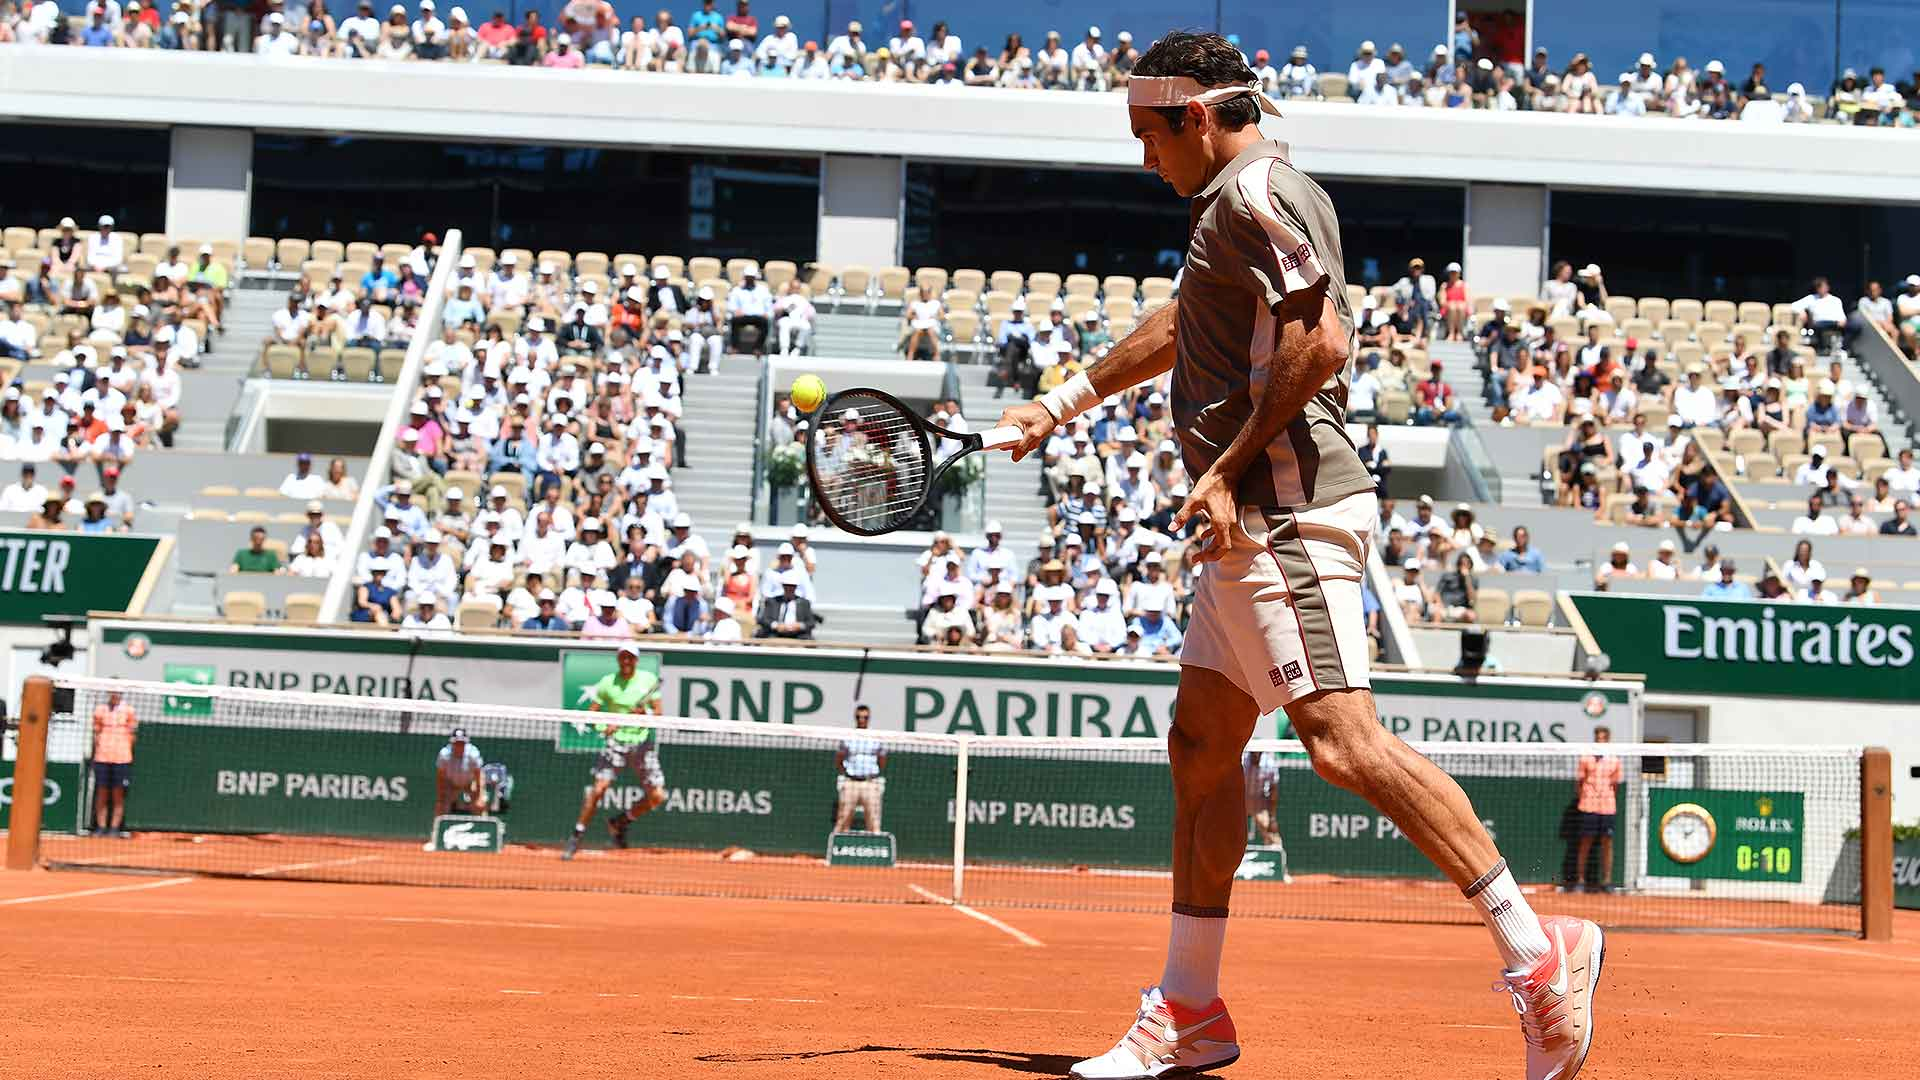 <a href='https://www.atptour.com/en/players/roger-federer/f324/overview'>Roger Federer</a> reaches the quarter-finals at <a href='https://www.atptour.com/en/tournaments/roland-garros/520/overview'>Roland Garros</a>